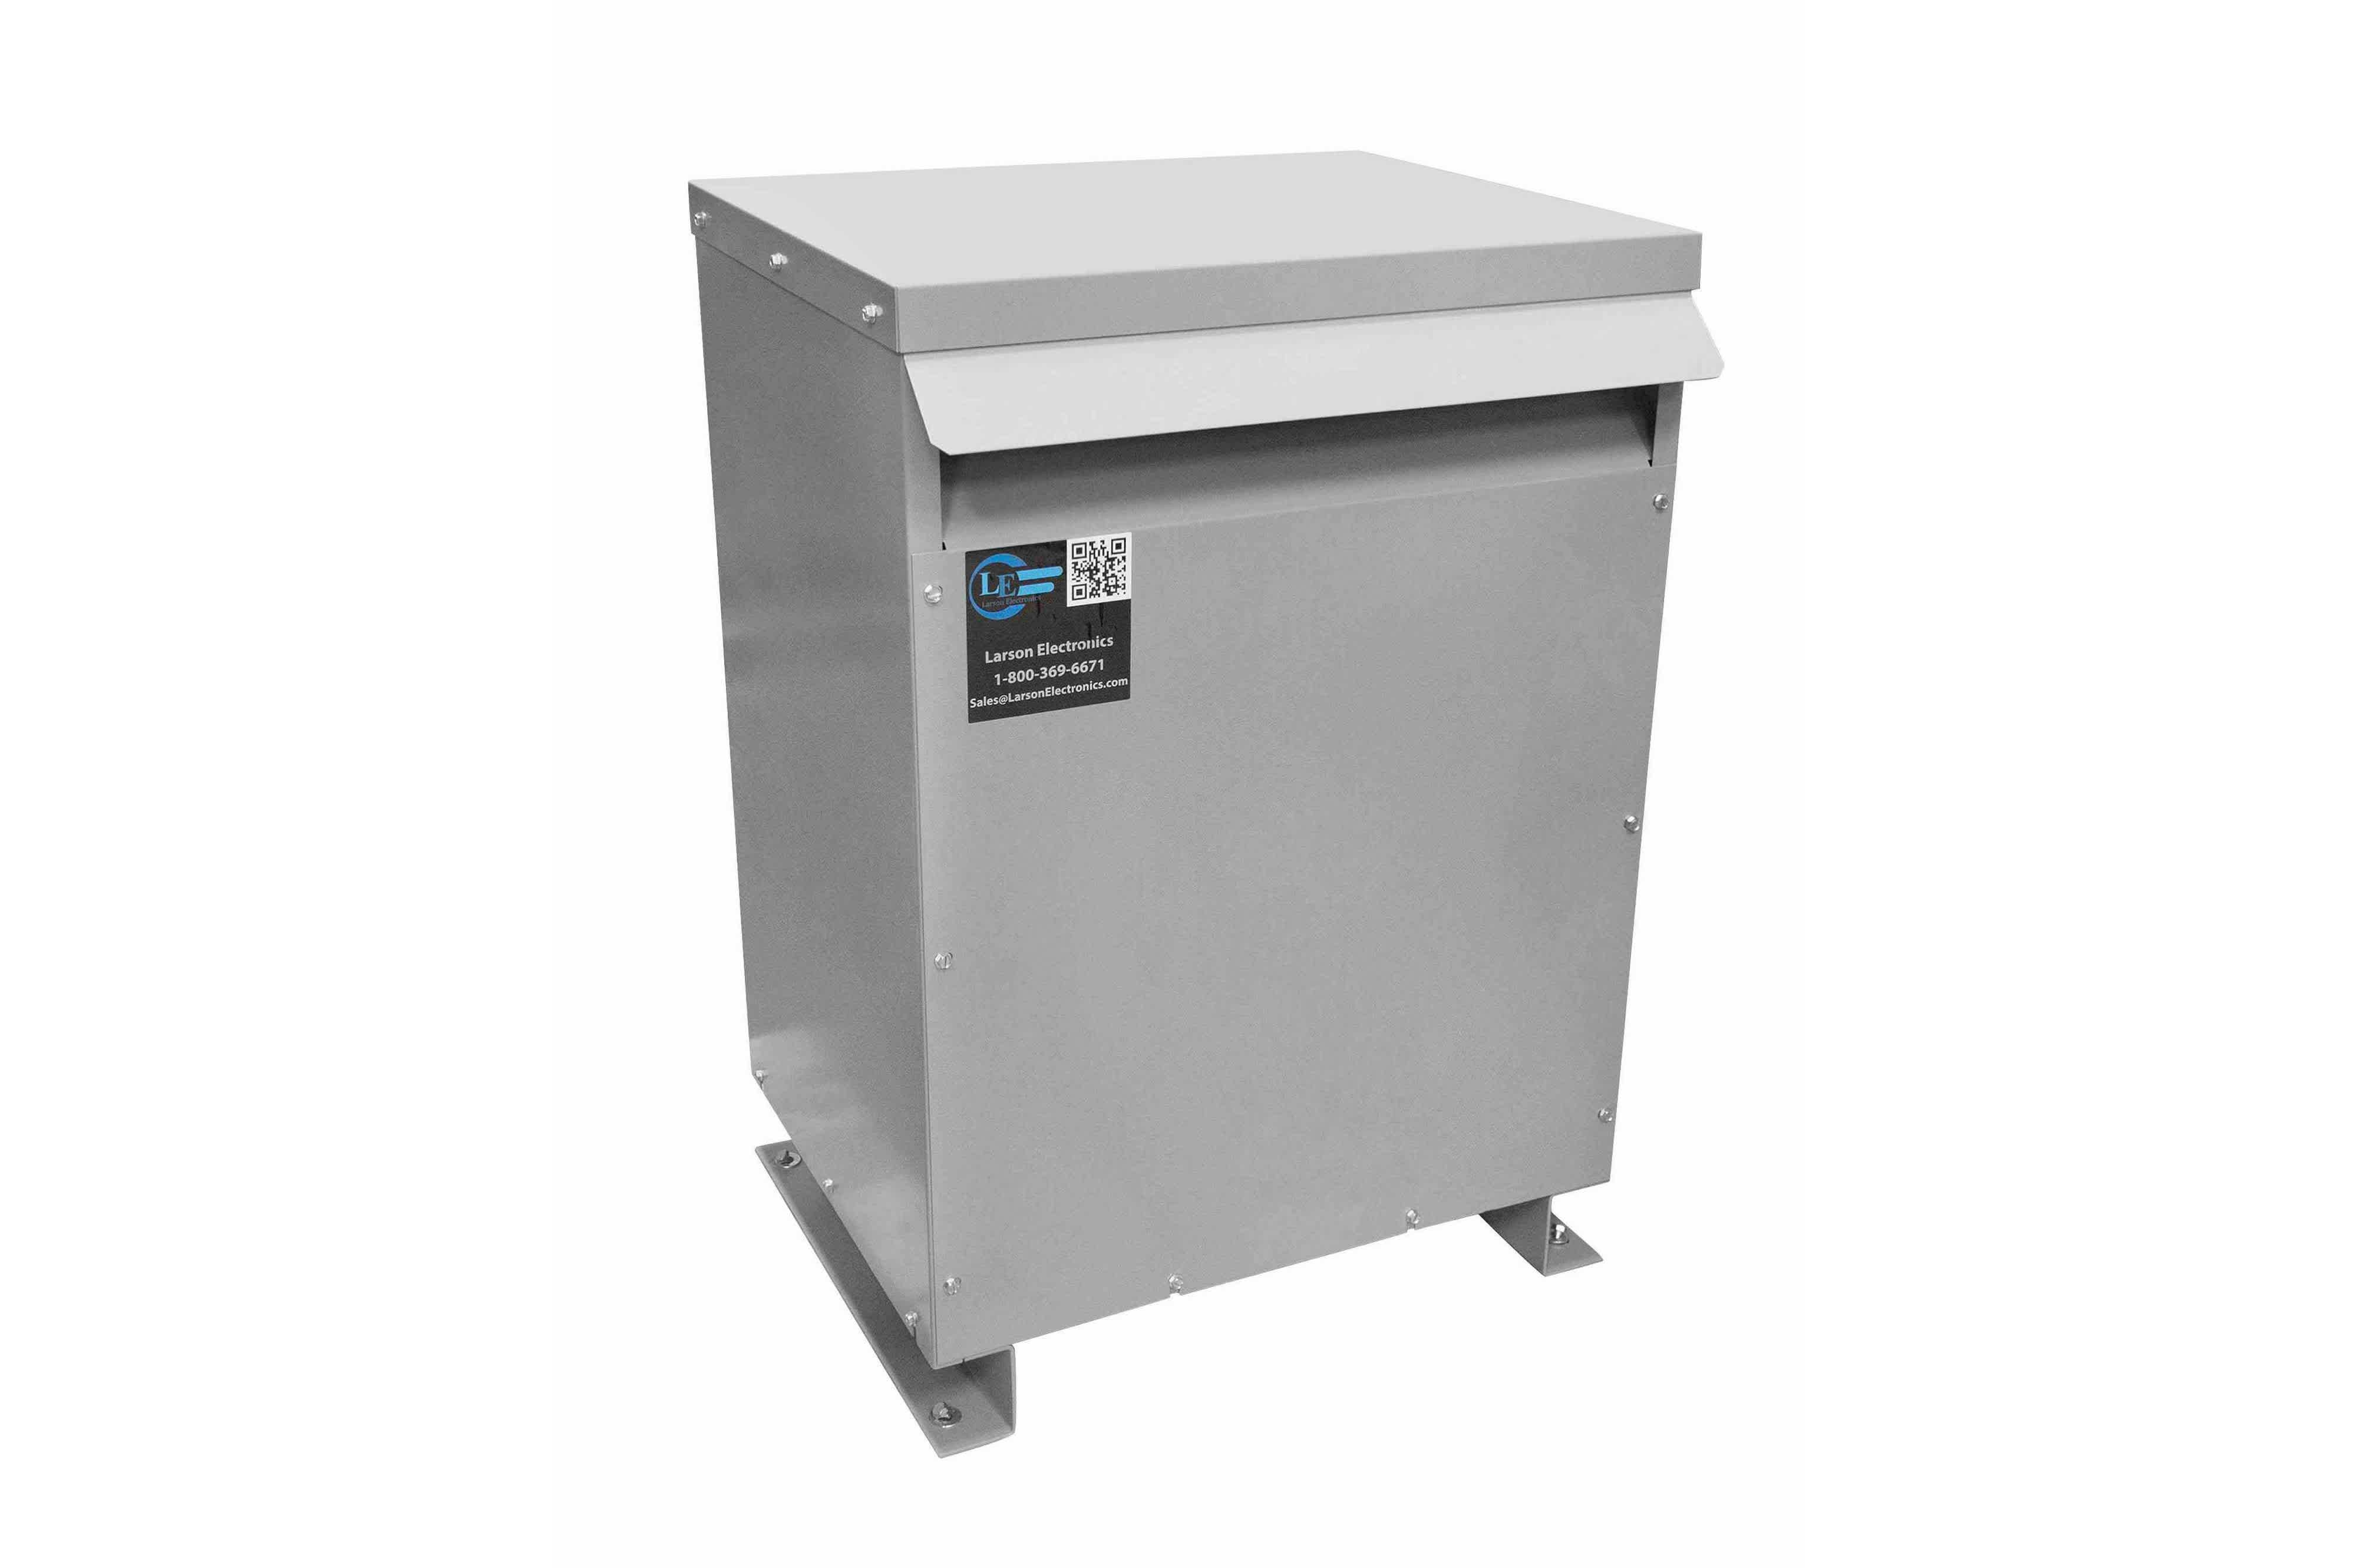 250 kVA 3PH DOE Transformer, 575V Delta Primary, 208Y/120 Wye-N Secondary, N3R, Ventilated, 60 Hz